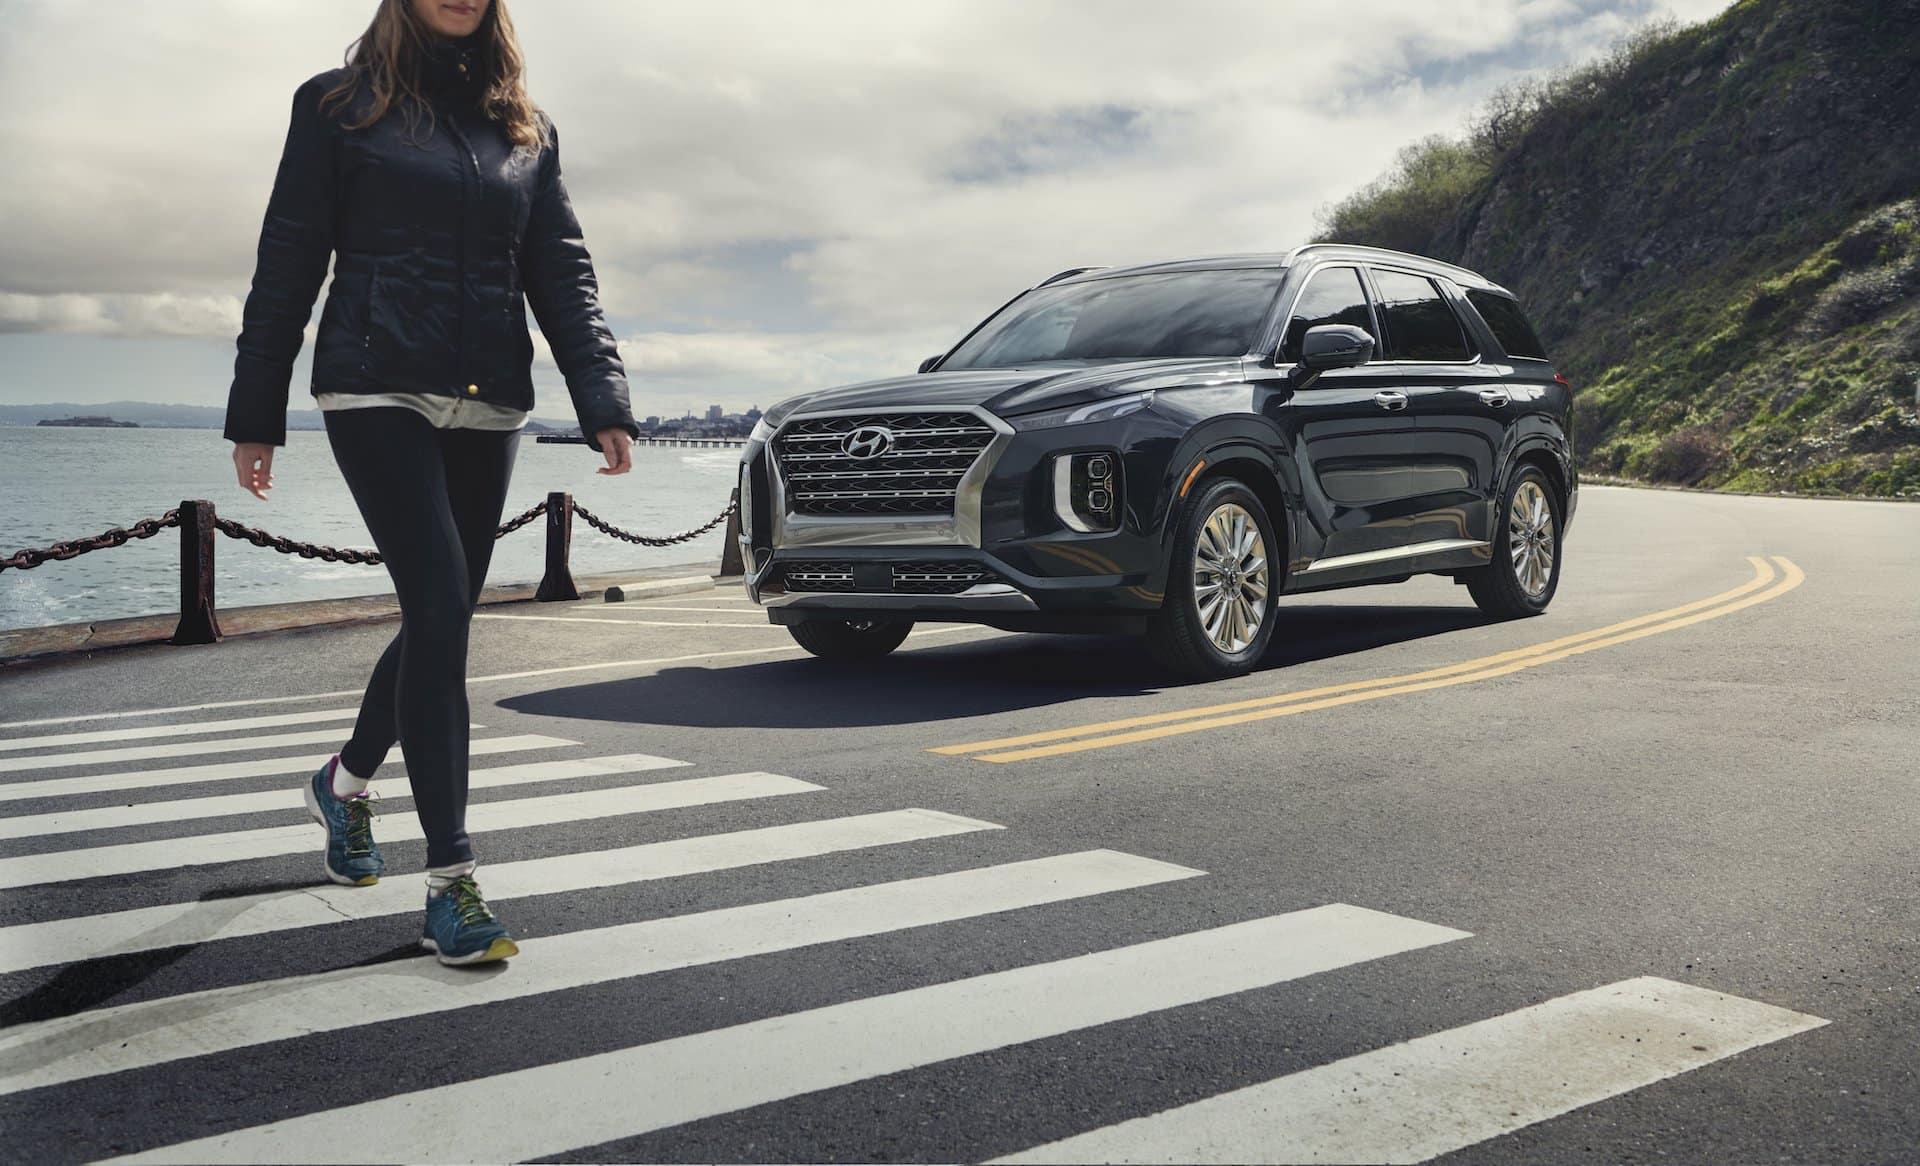 2020 Hyundai Palisade Looks